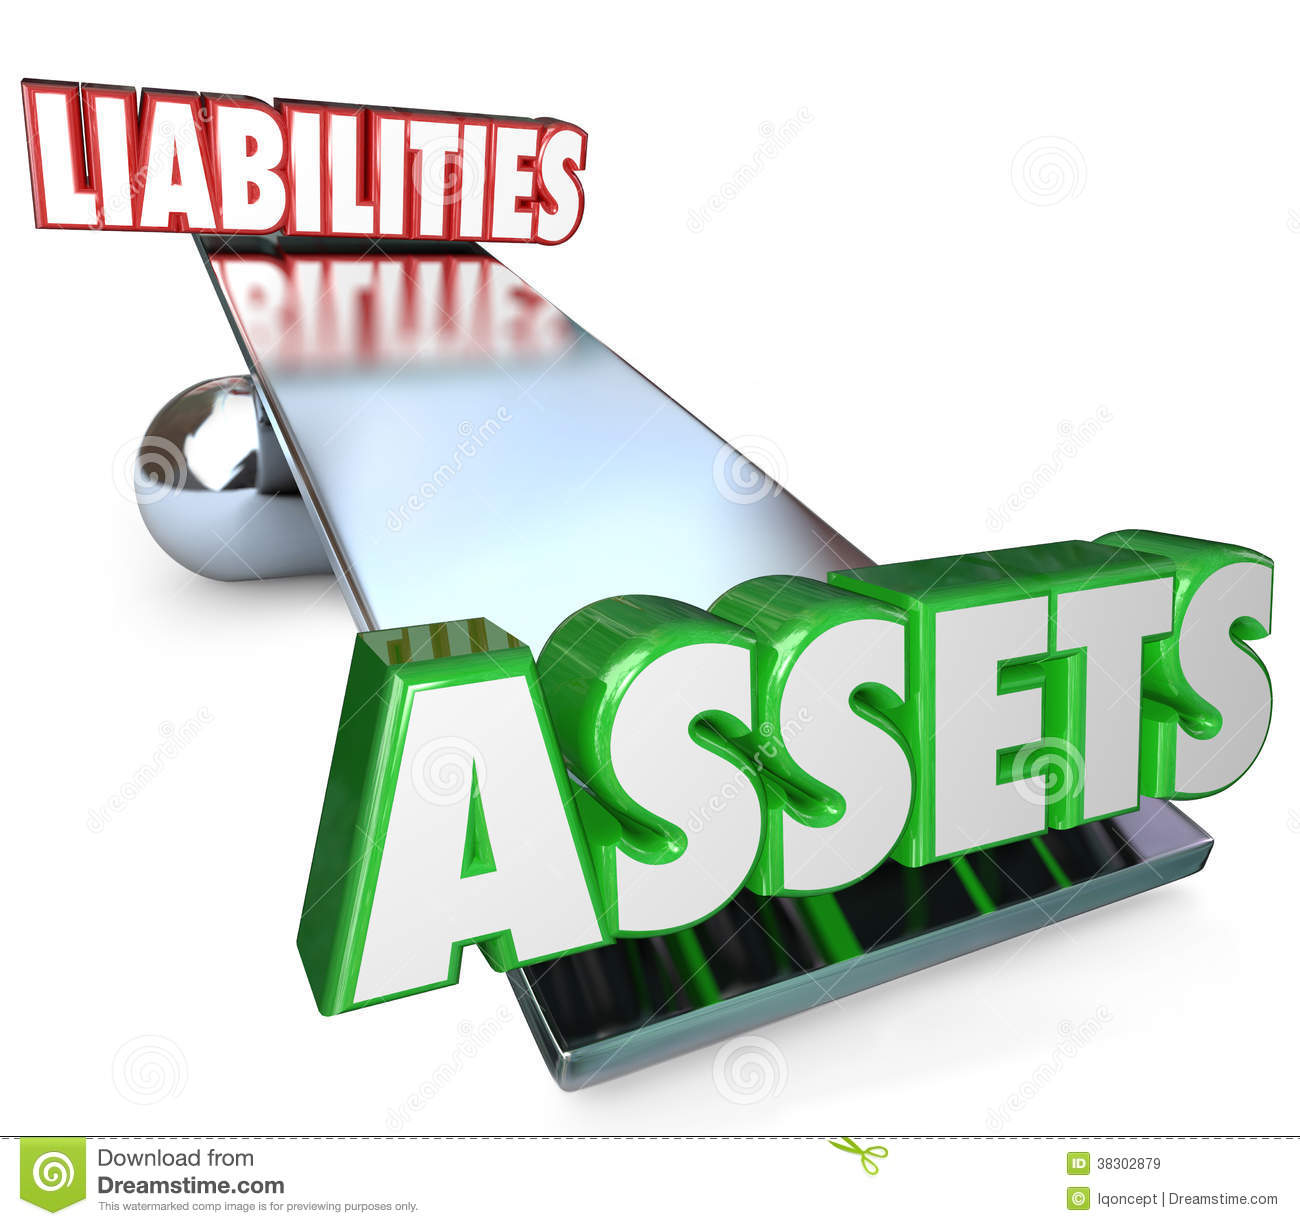 Assets clipart.